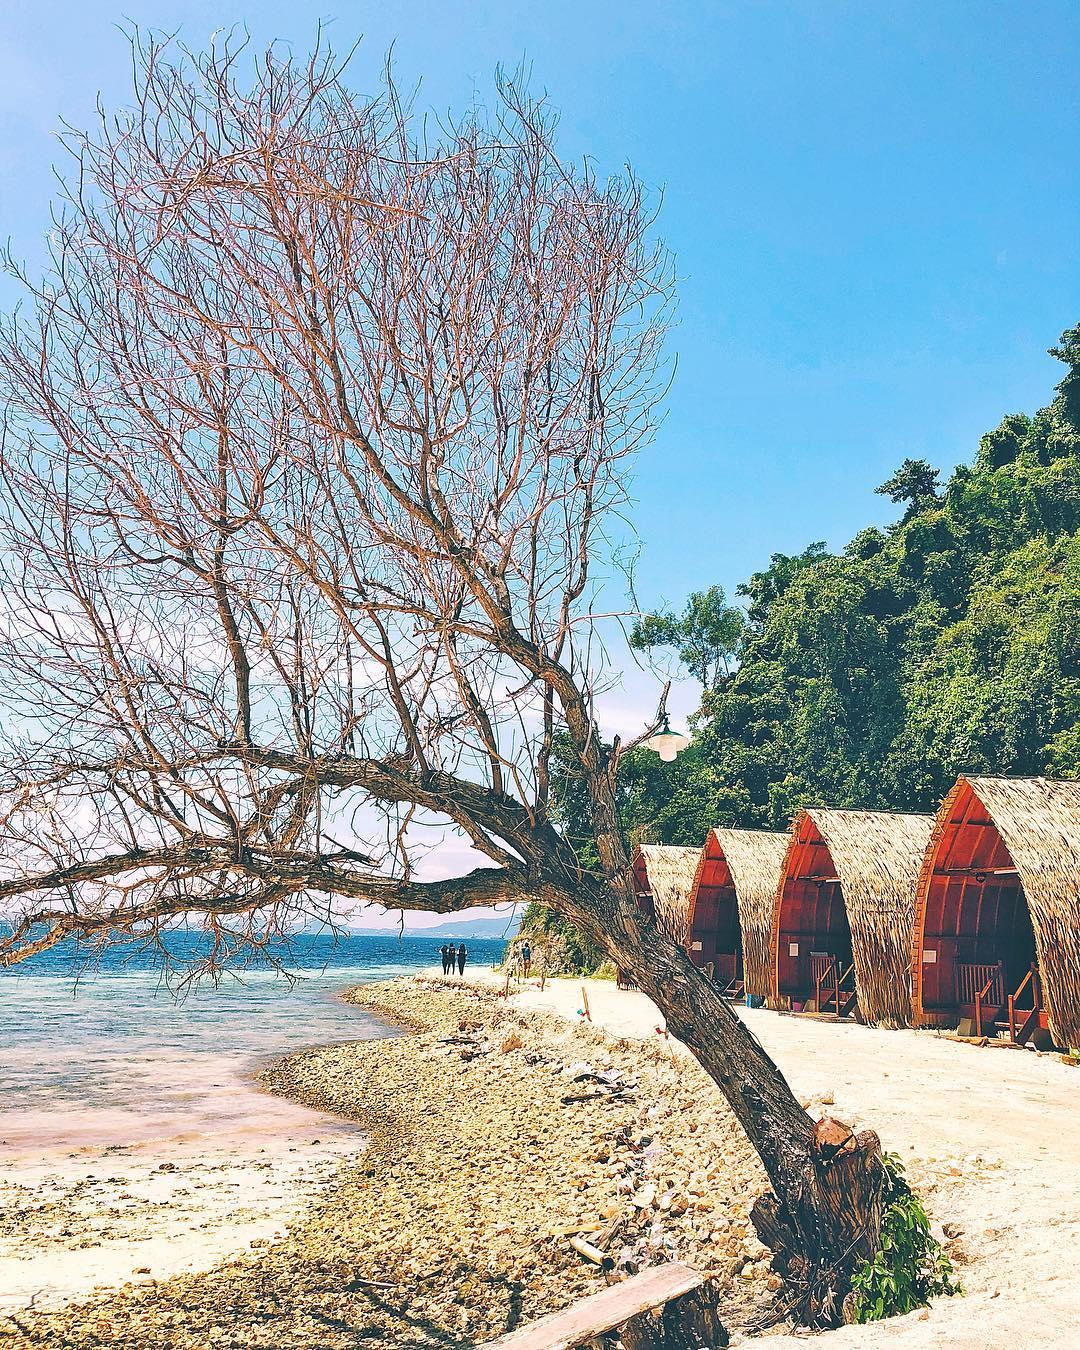 6 Pantai Lampung yang Keindahannya Menyamai Bali